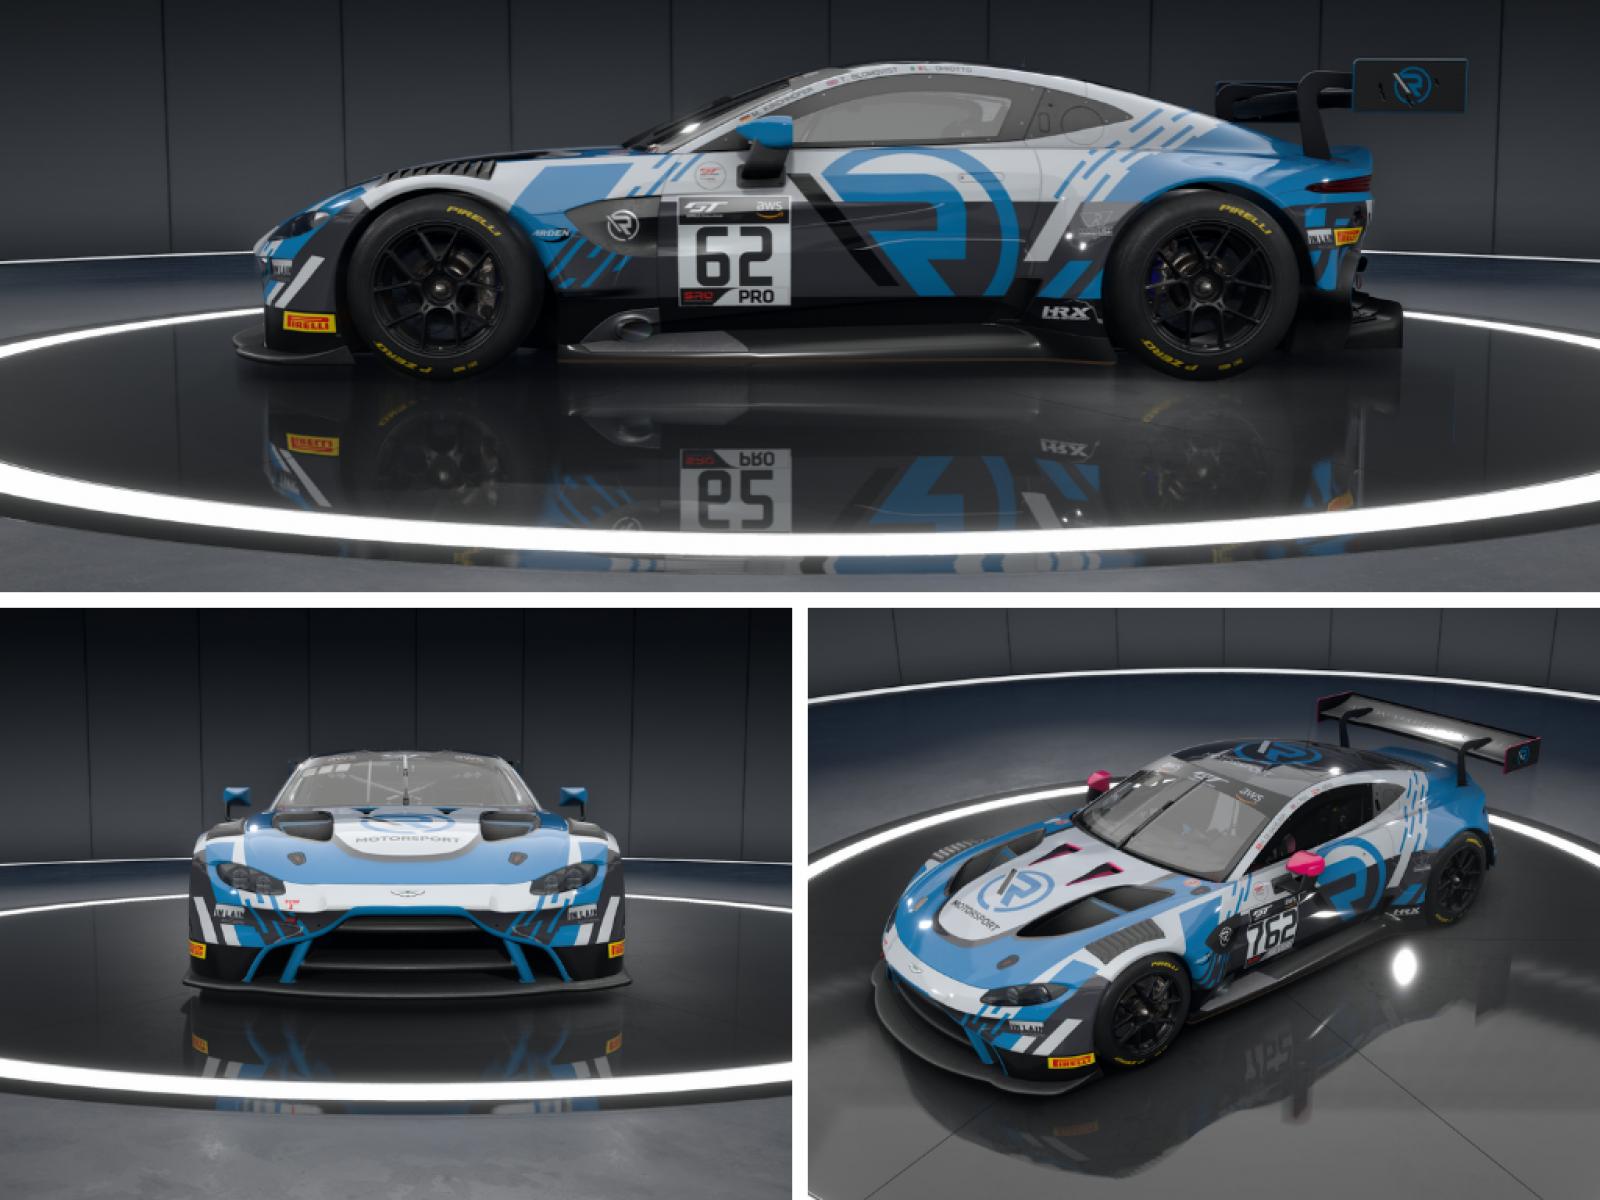 R Motorsport Reveals Aston Martin Livery For Sro E Sport Championship Assault Fanatec Gt World Challenge Europe Powered By Aws